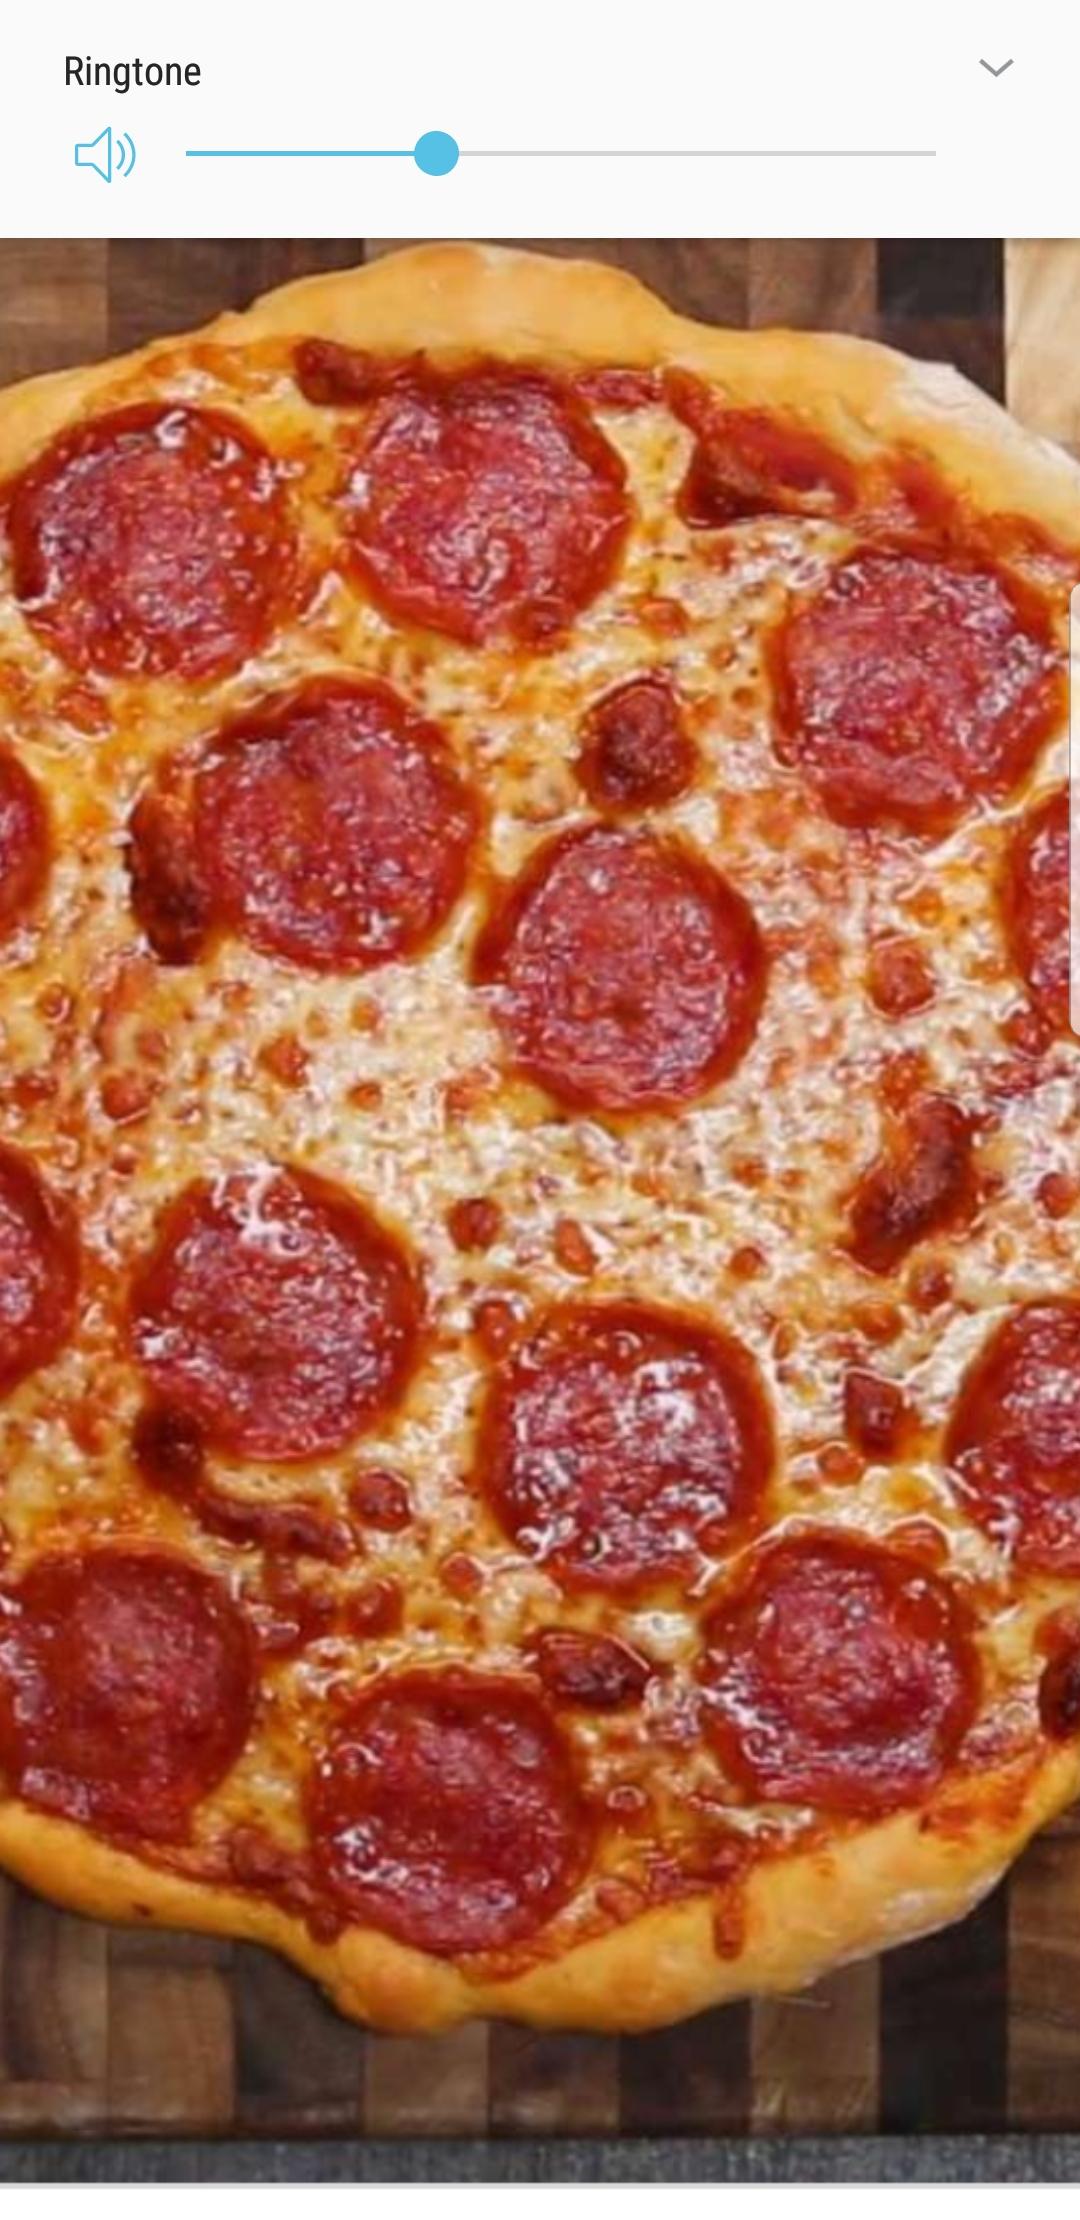 luis.ricardo on One Bite Pizza App